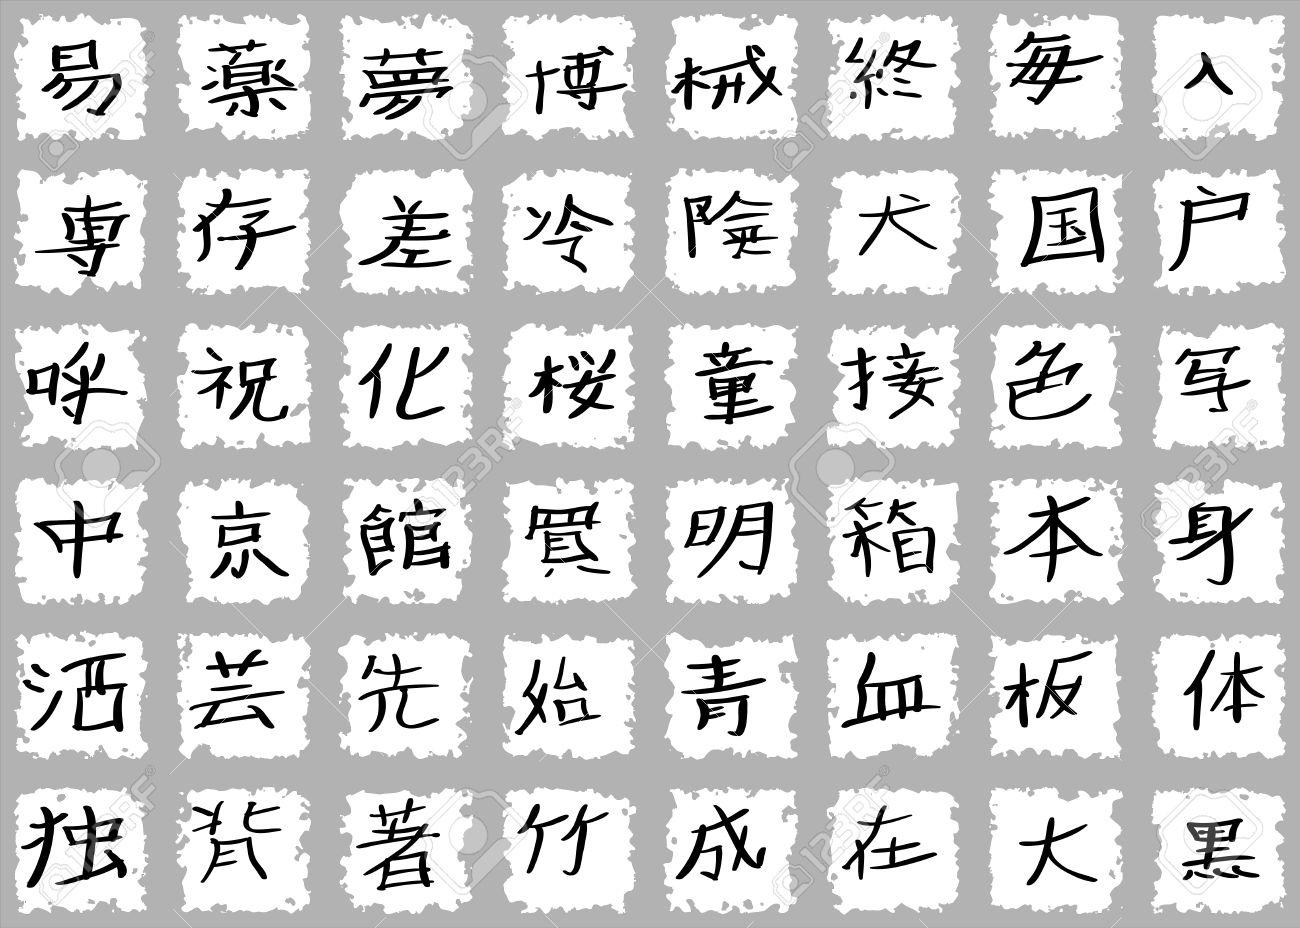 Japanese Kanji Characters.